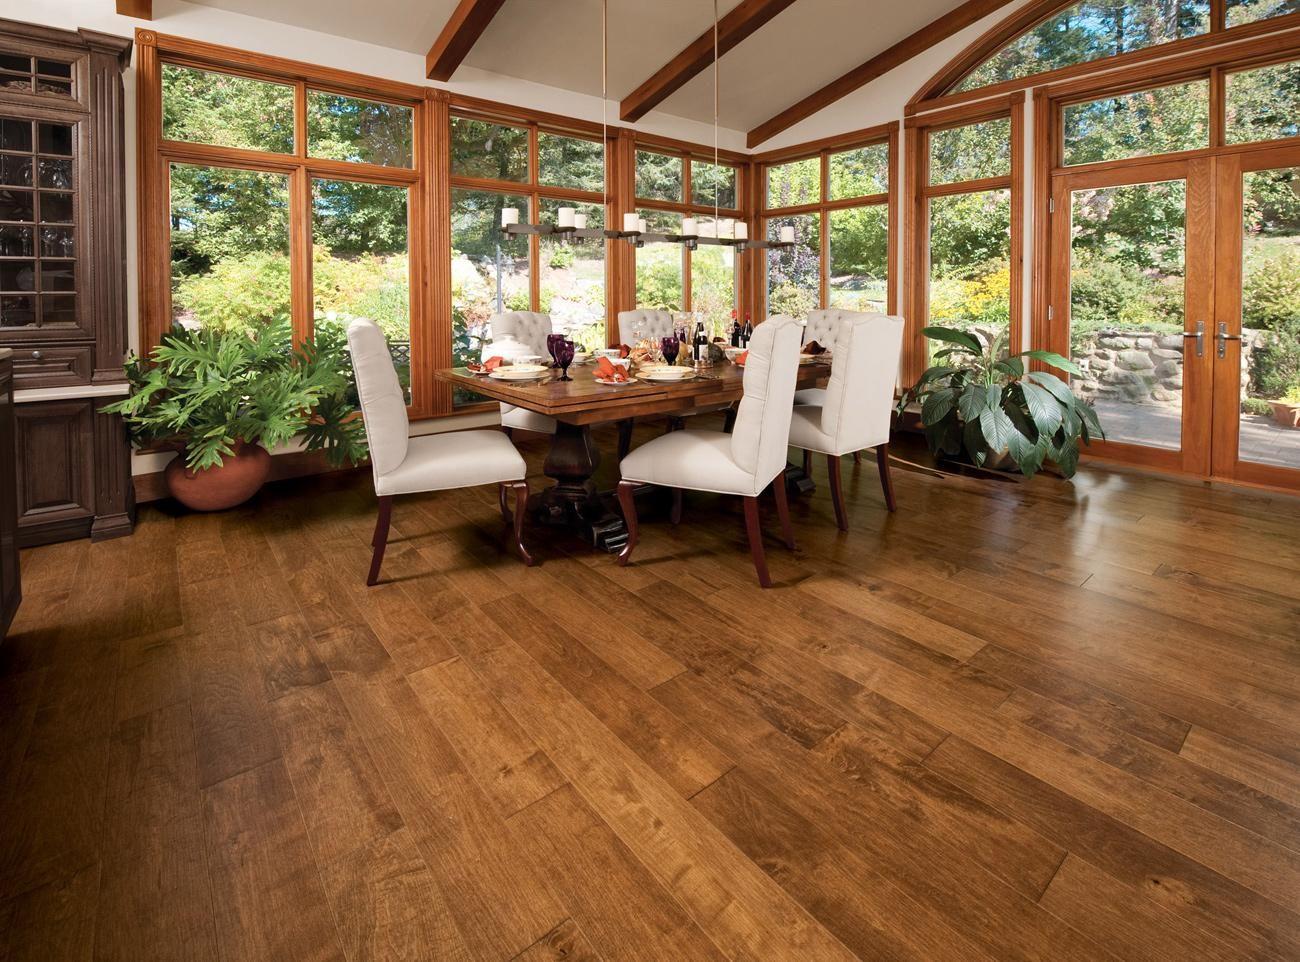 Interior design maple wood floors trendsfloor cute and wonderful